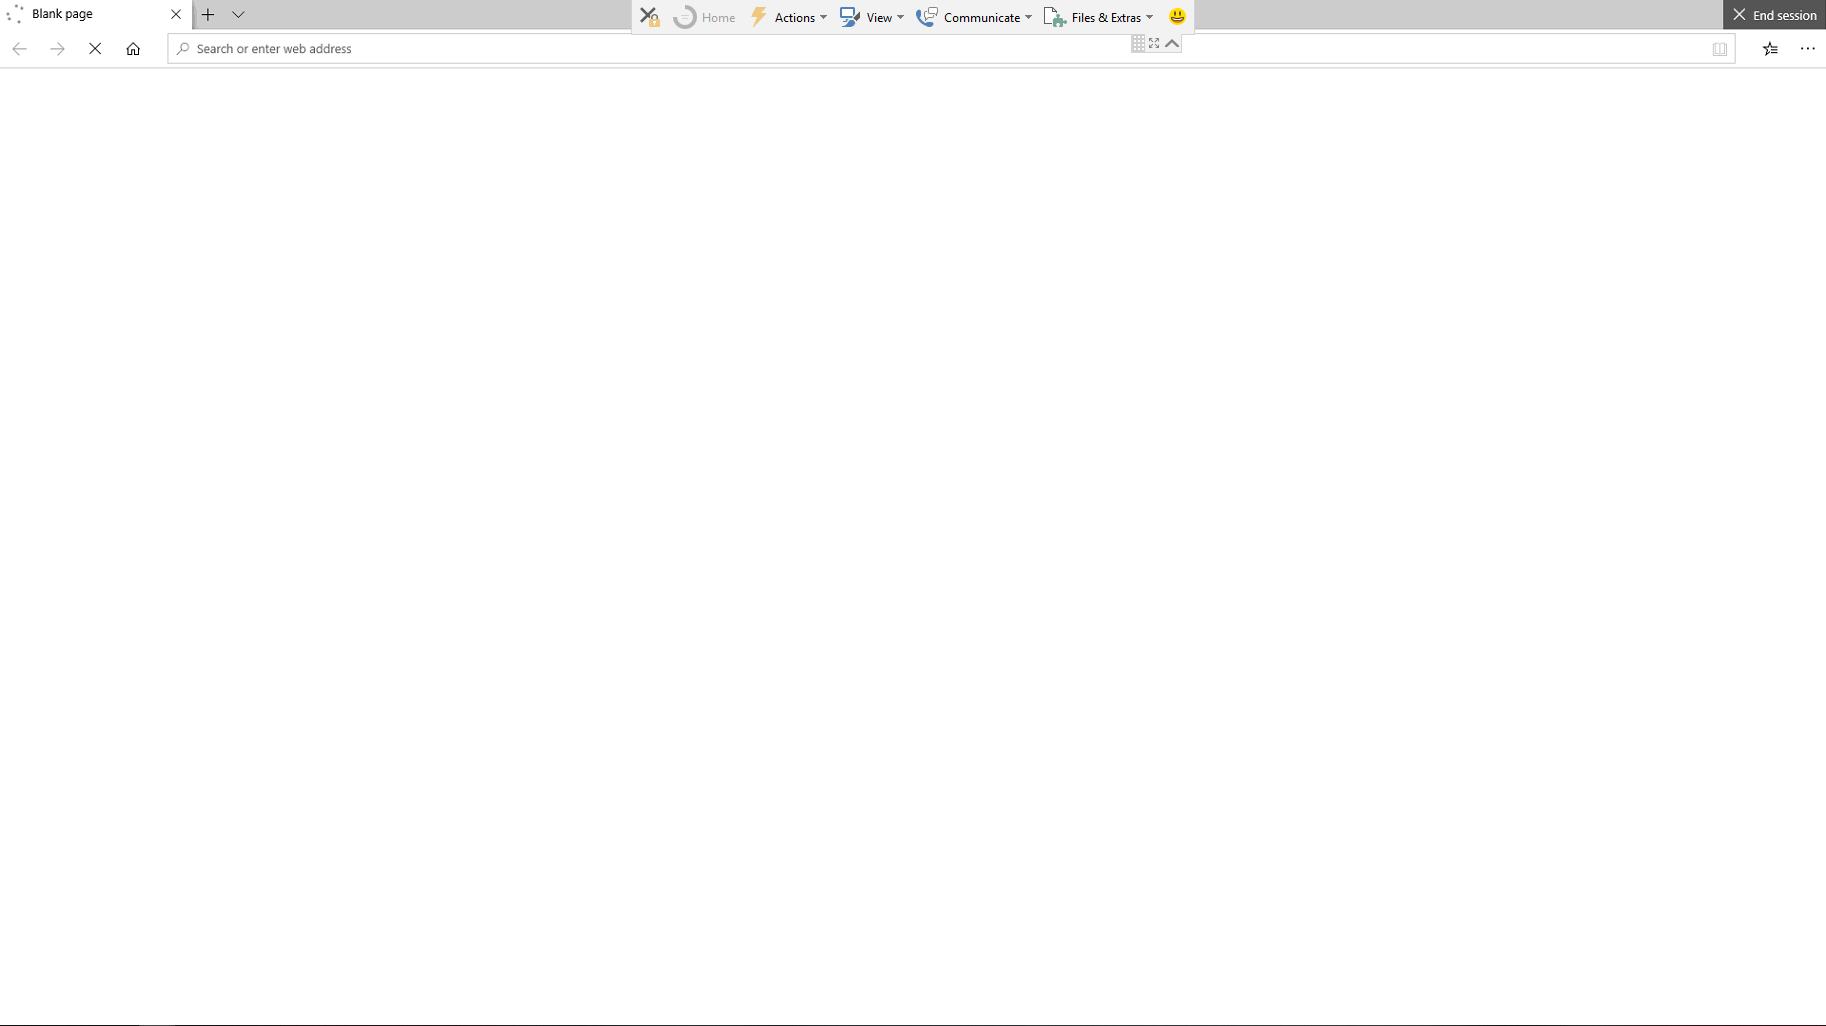 Issue with Windows 10 Single App Kiosk mode not re-loading b332a126-3453-472a-9a09-74b32de9897f?upload=true.png